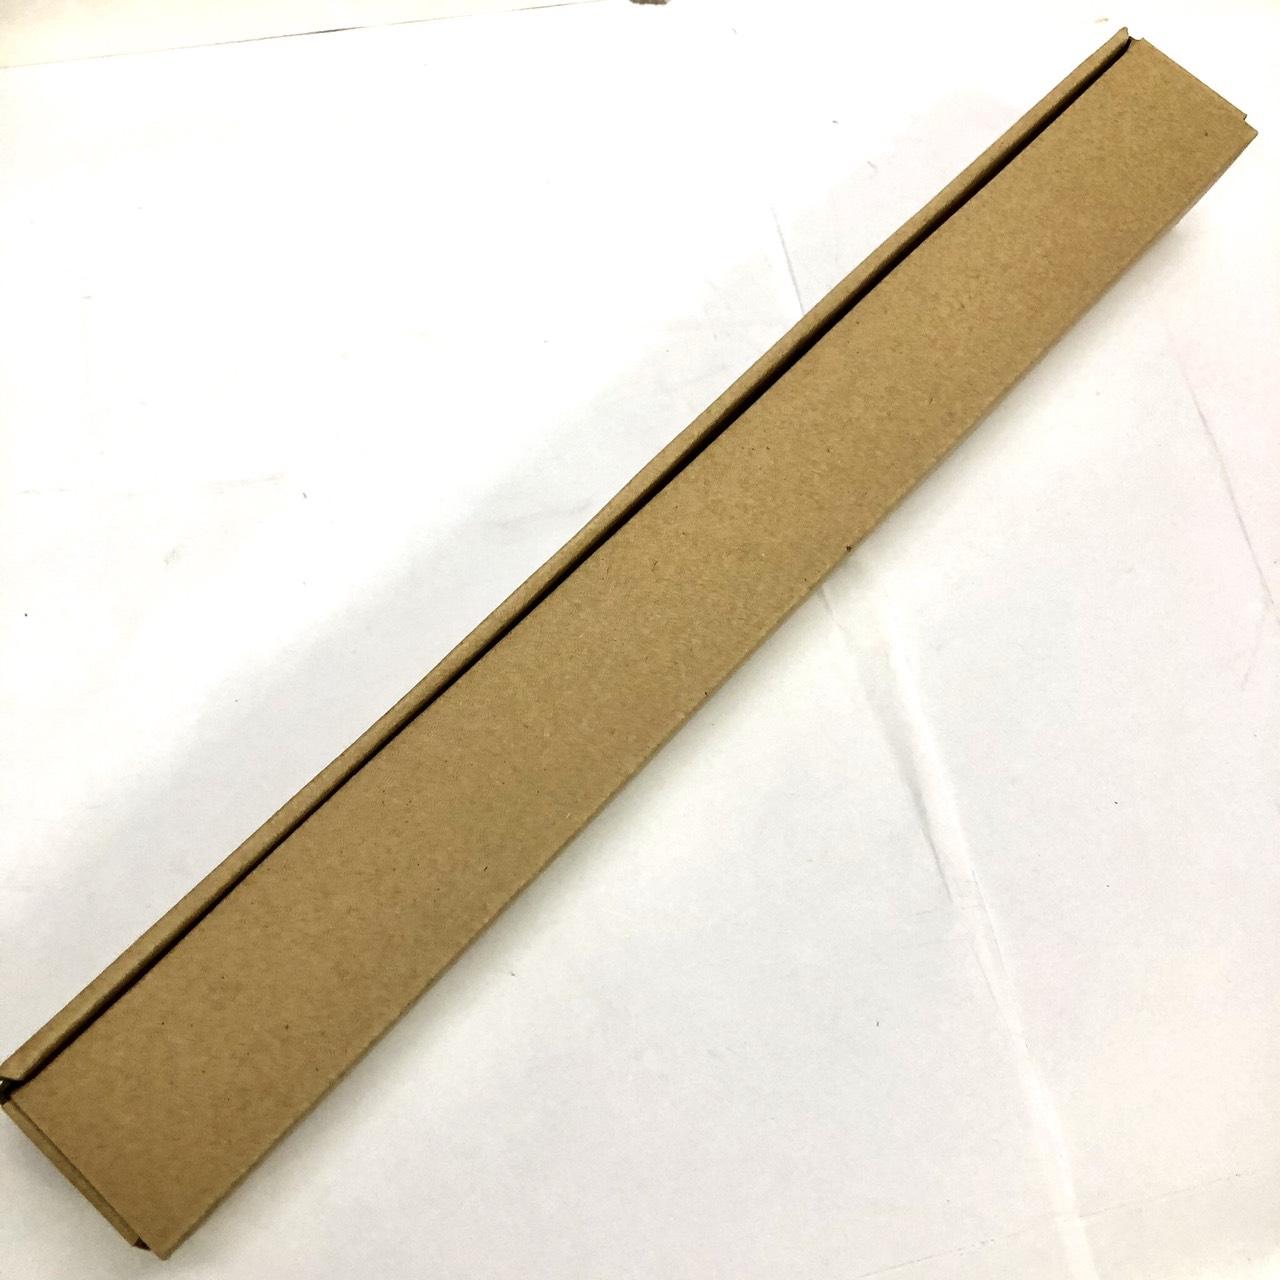 Cuộn giấy lau dùng cho máy photocopy Toshiba E 550, 650, 520, 720, 850, 555, 655, 755, 556, 656, 756, 657, 857